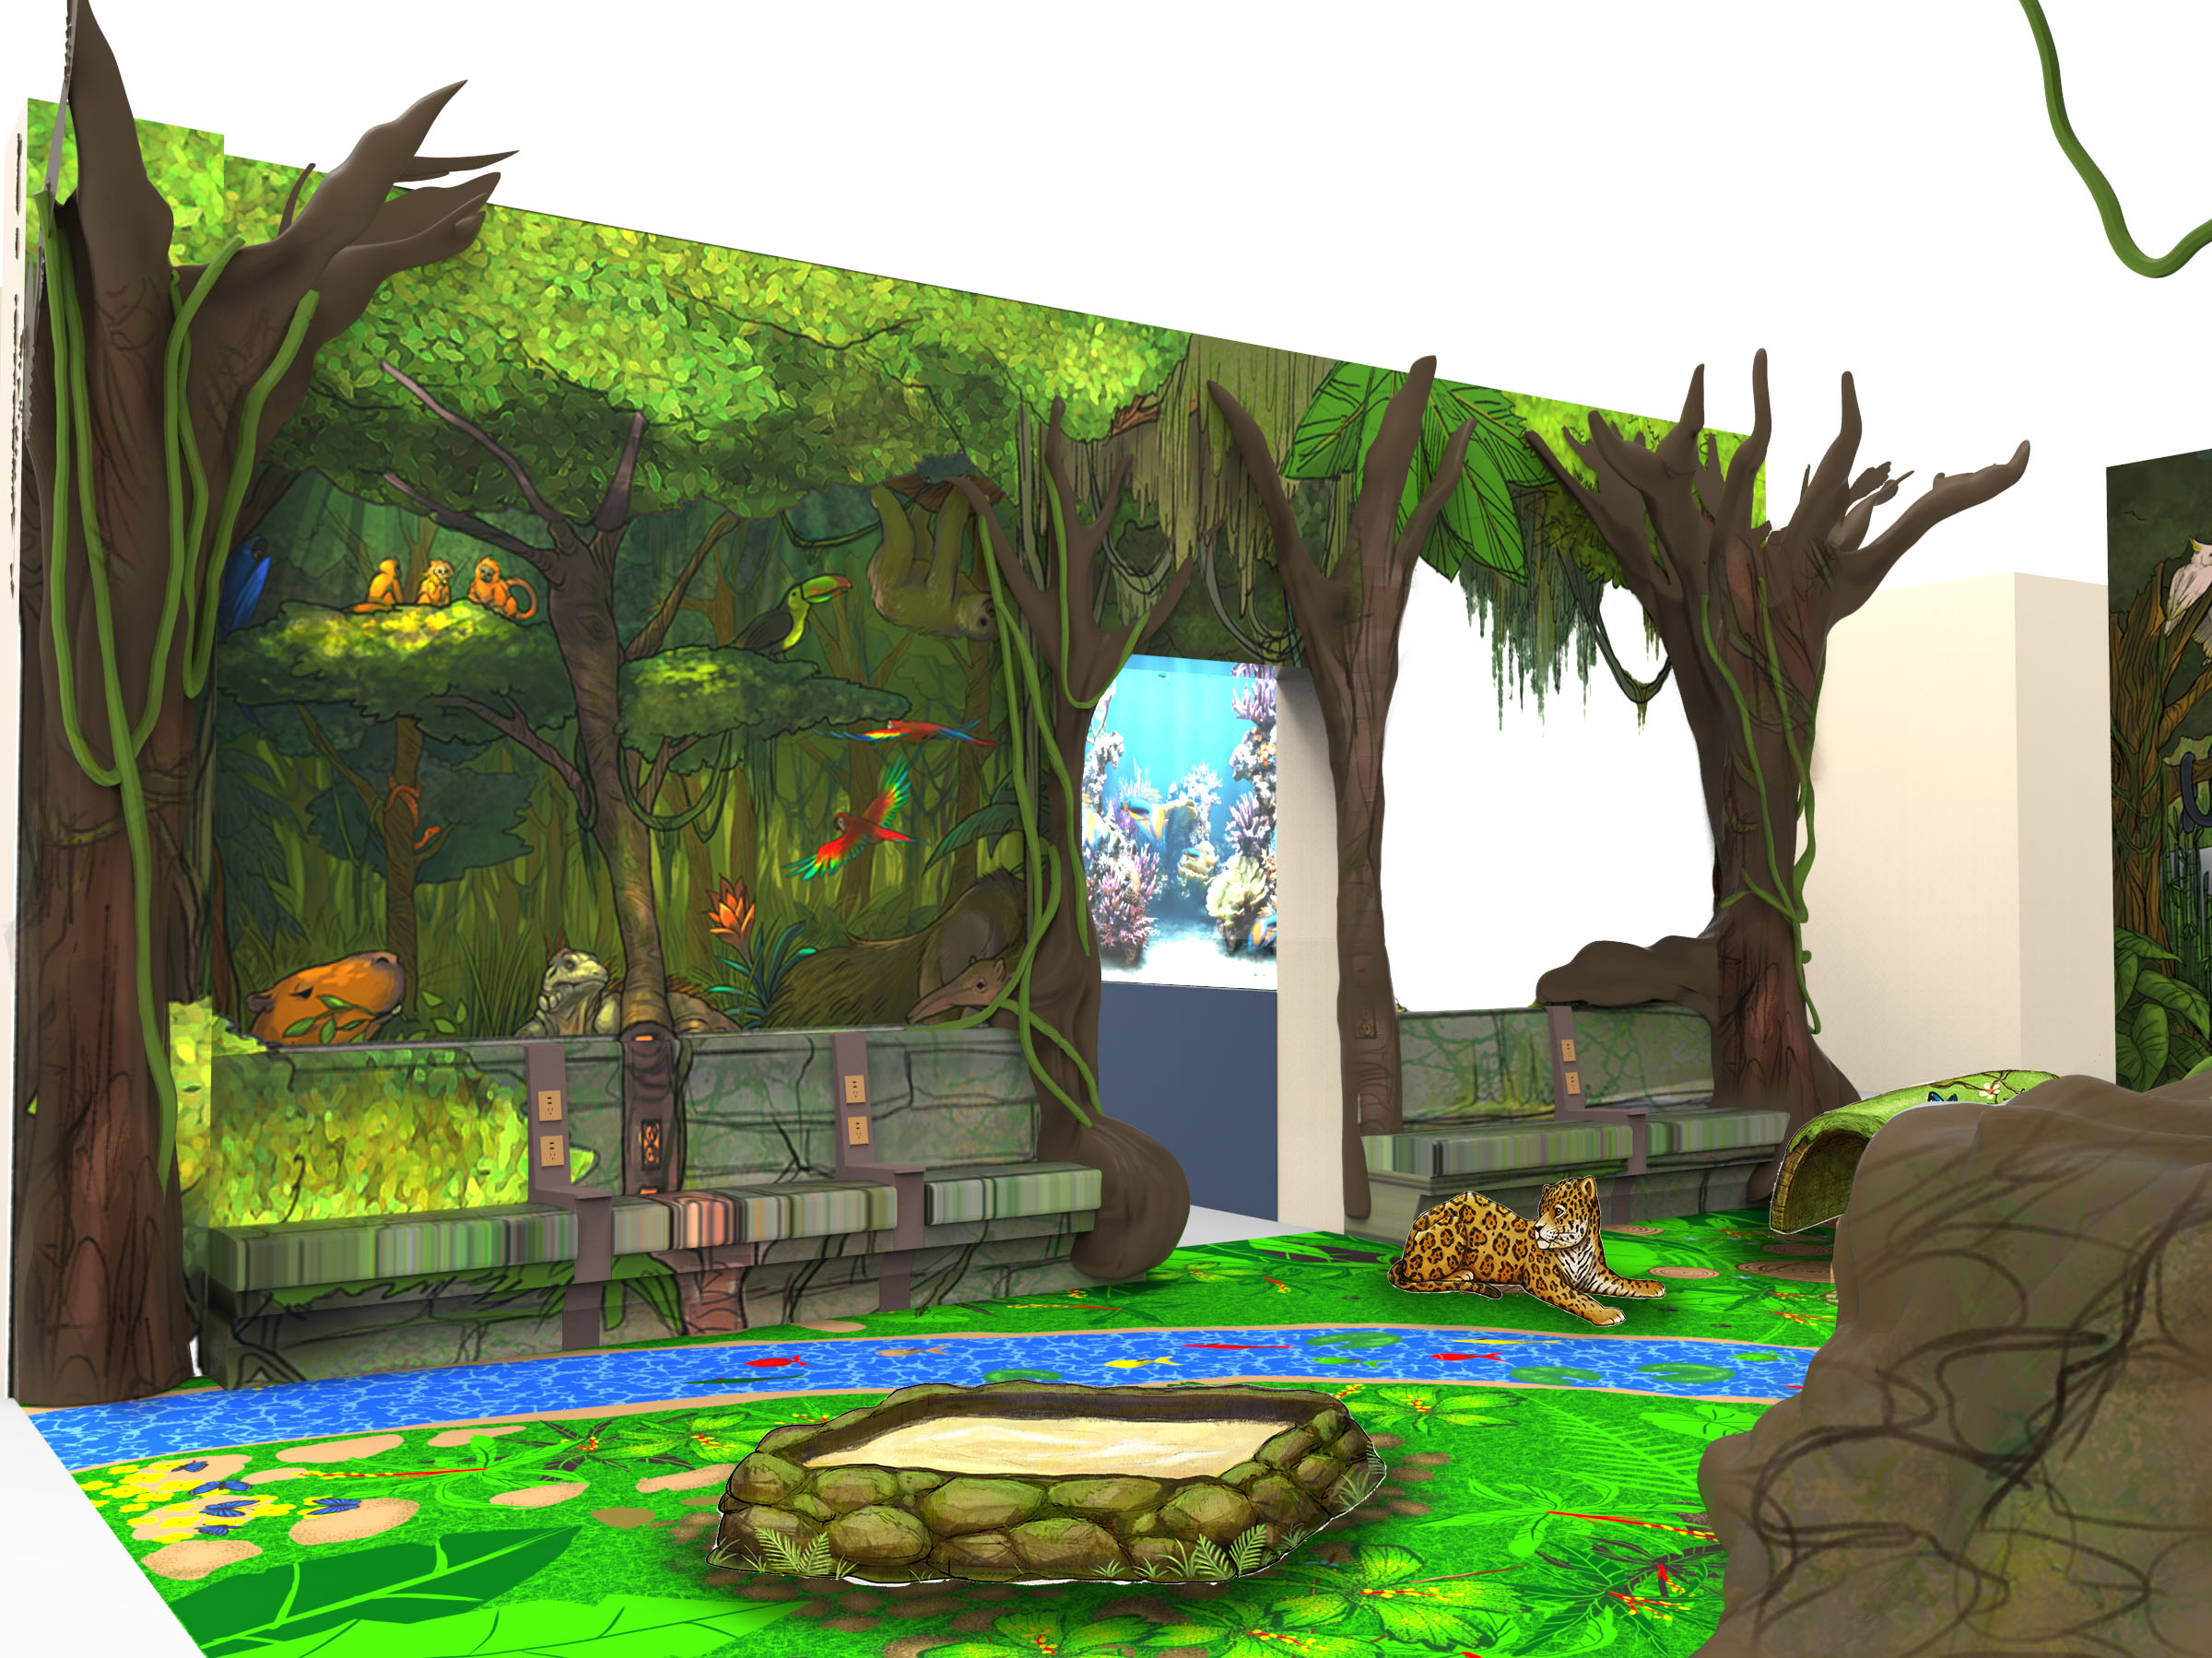 Urban Jungle Playarea 3d Rendering